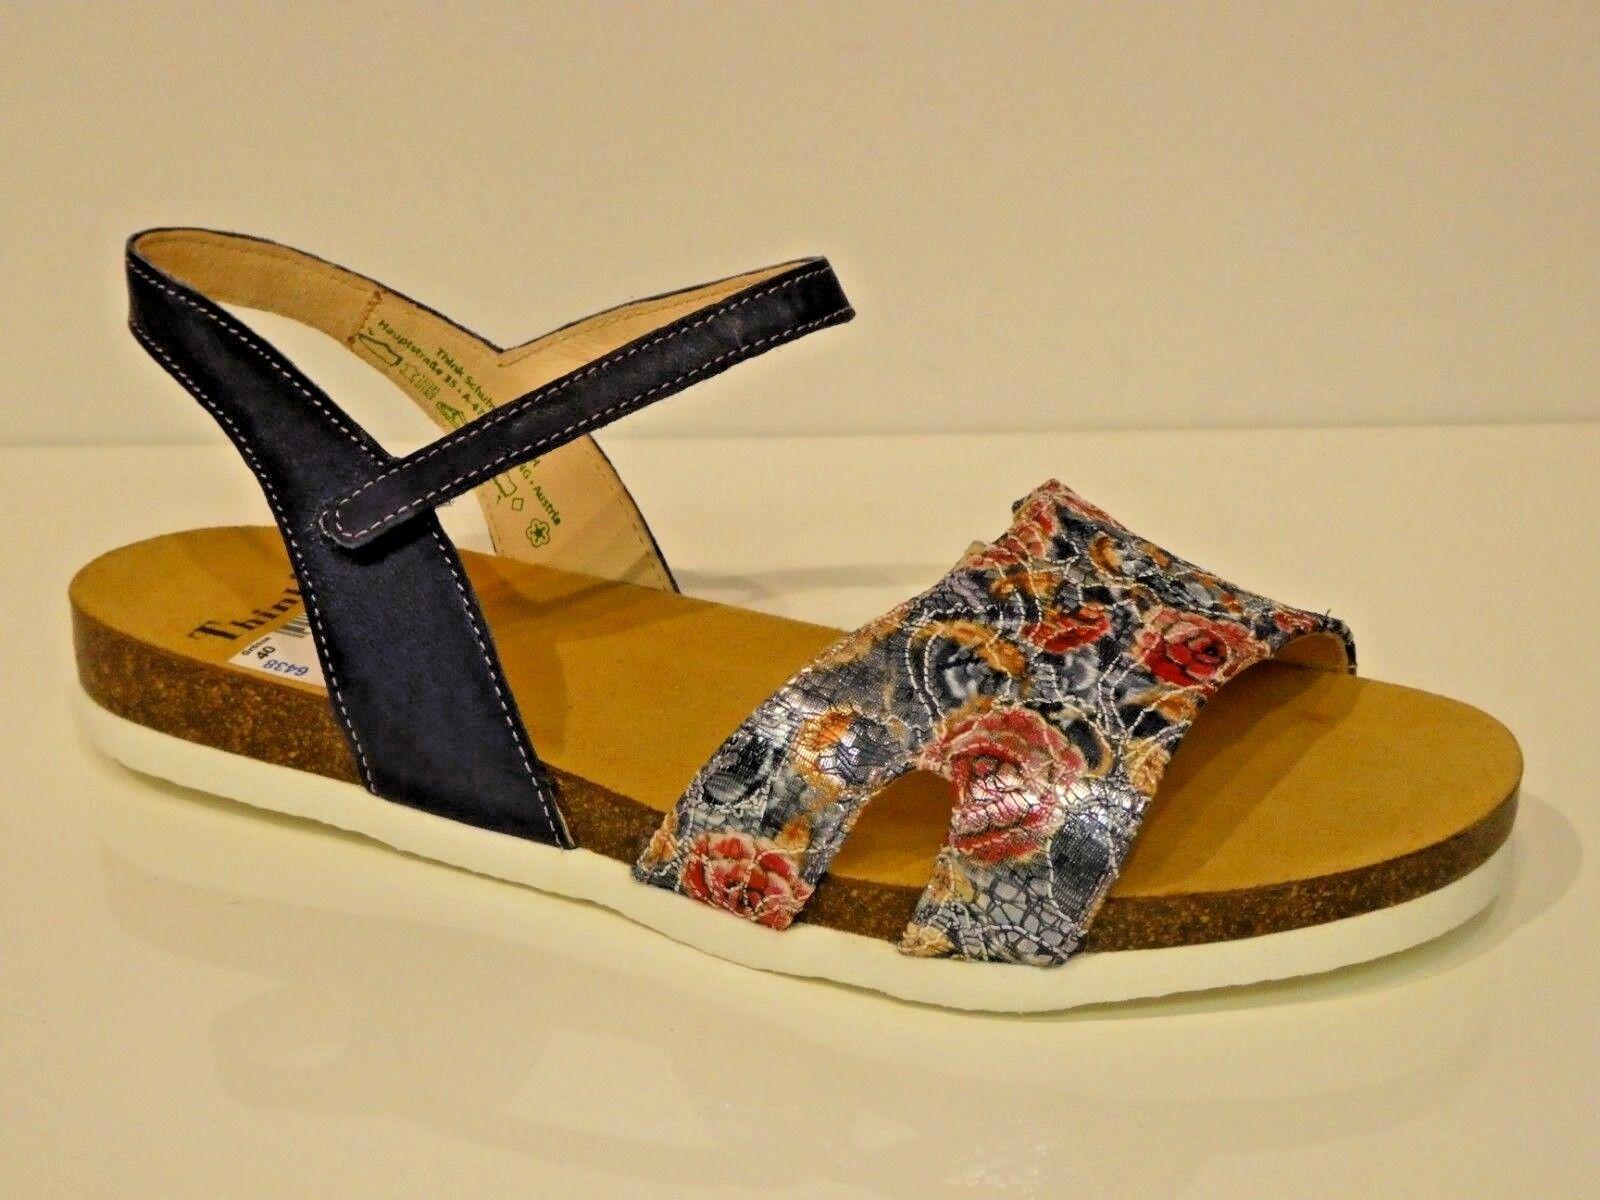 Think Schuhe Sandalen Sandaletten Shik bequem capri blau Leder Textil